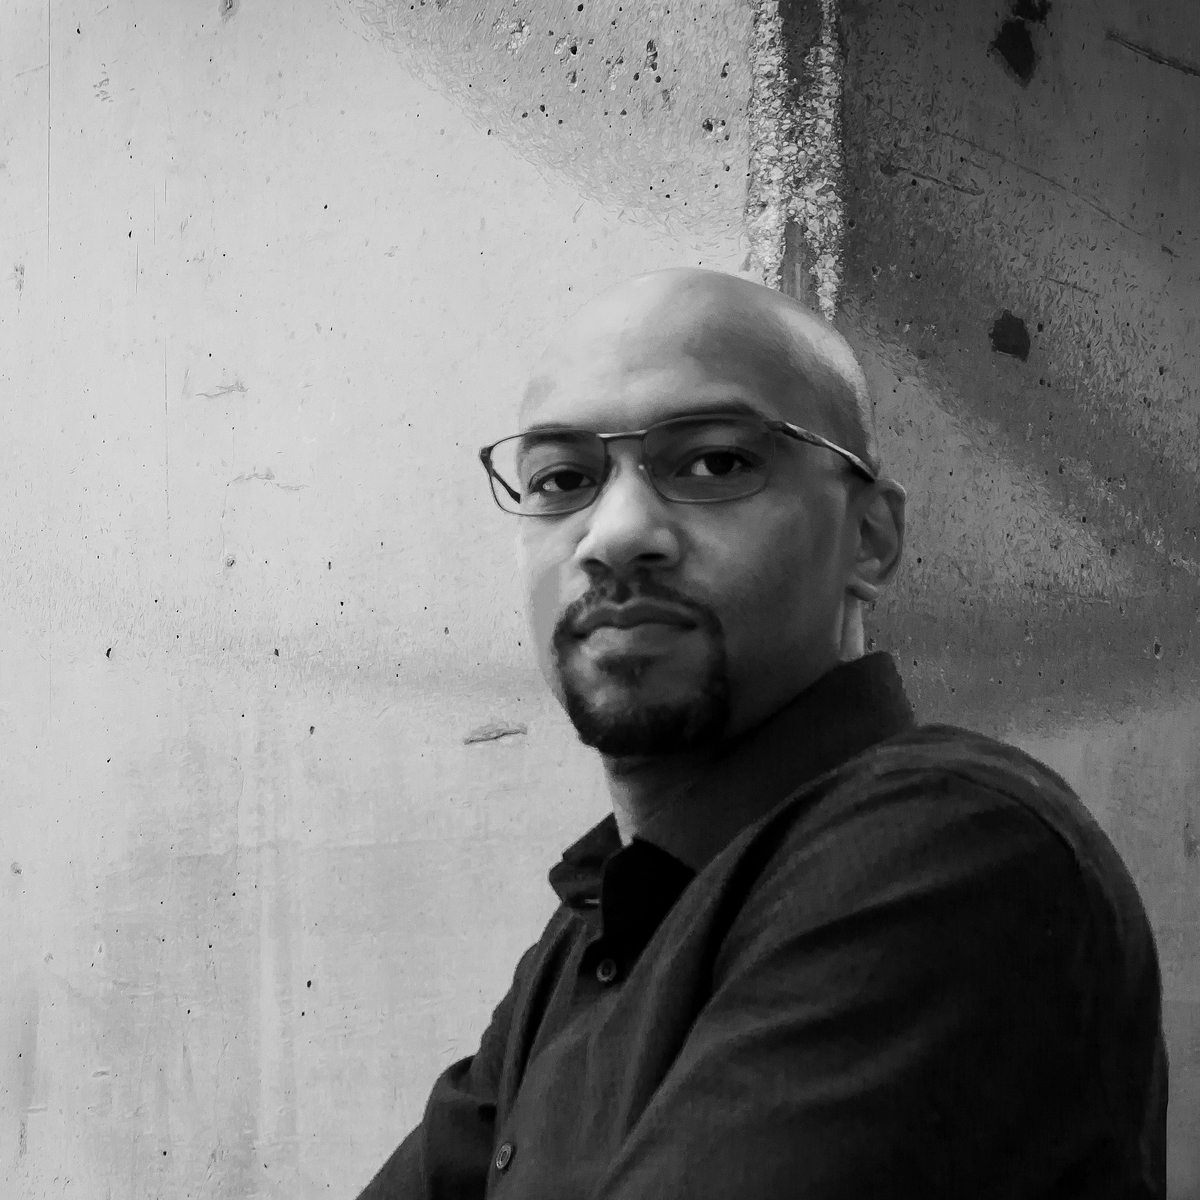 <b>Daziano Smith</b>#Creative Director#dsmith@radyca.com